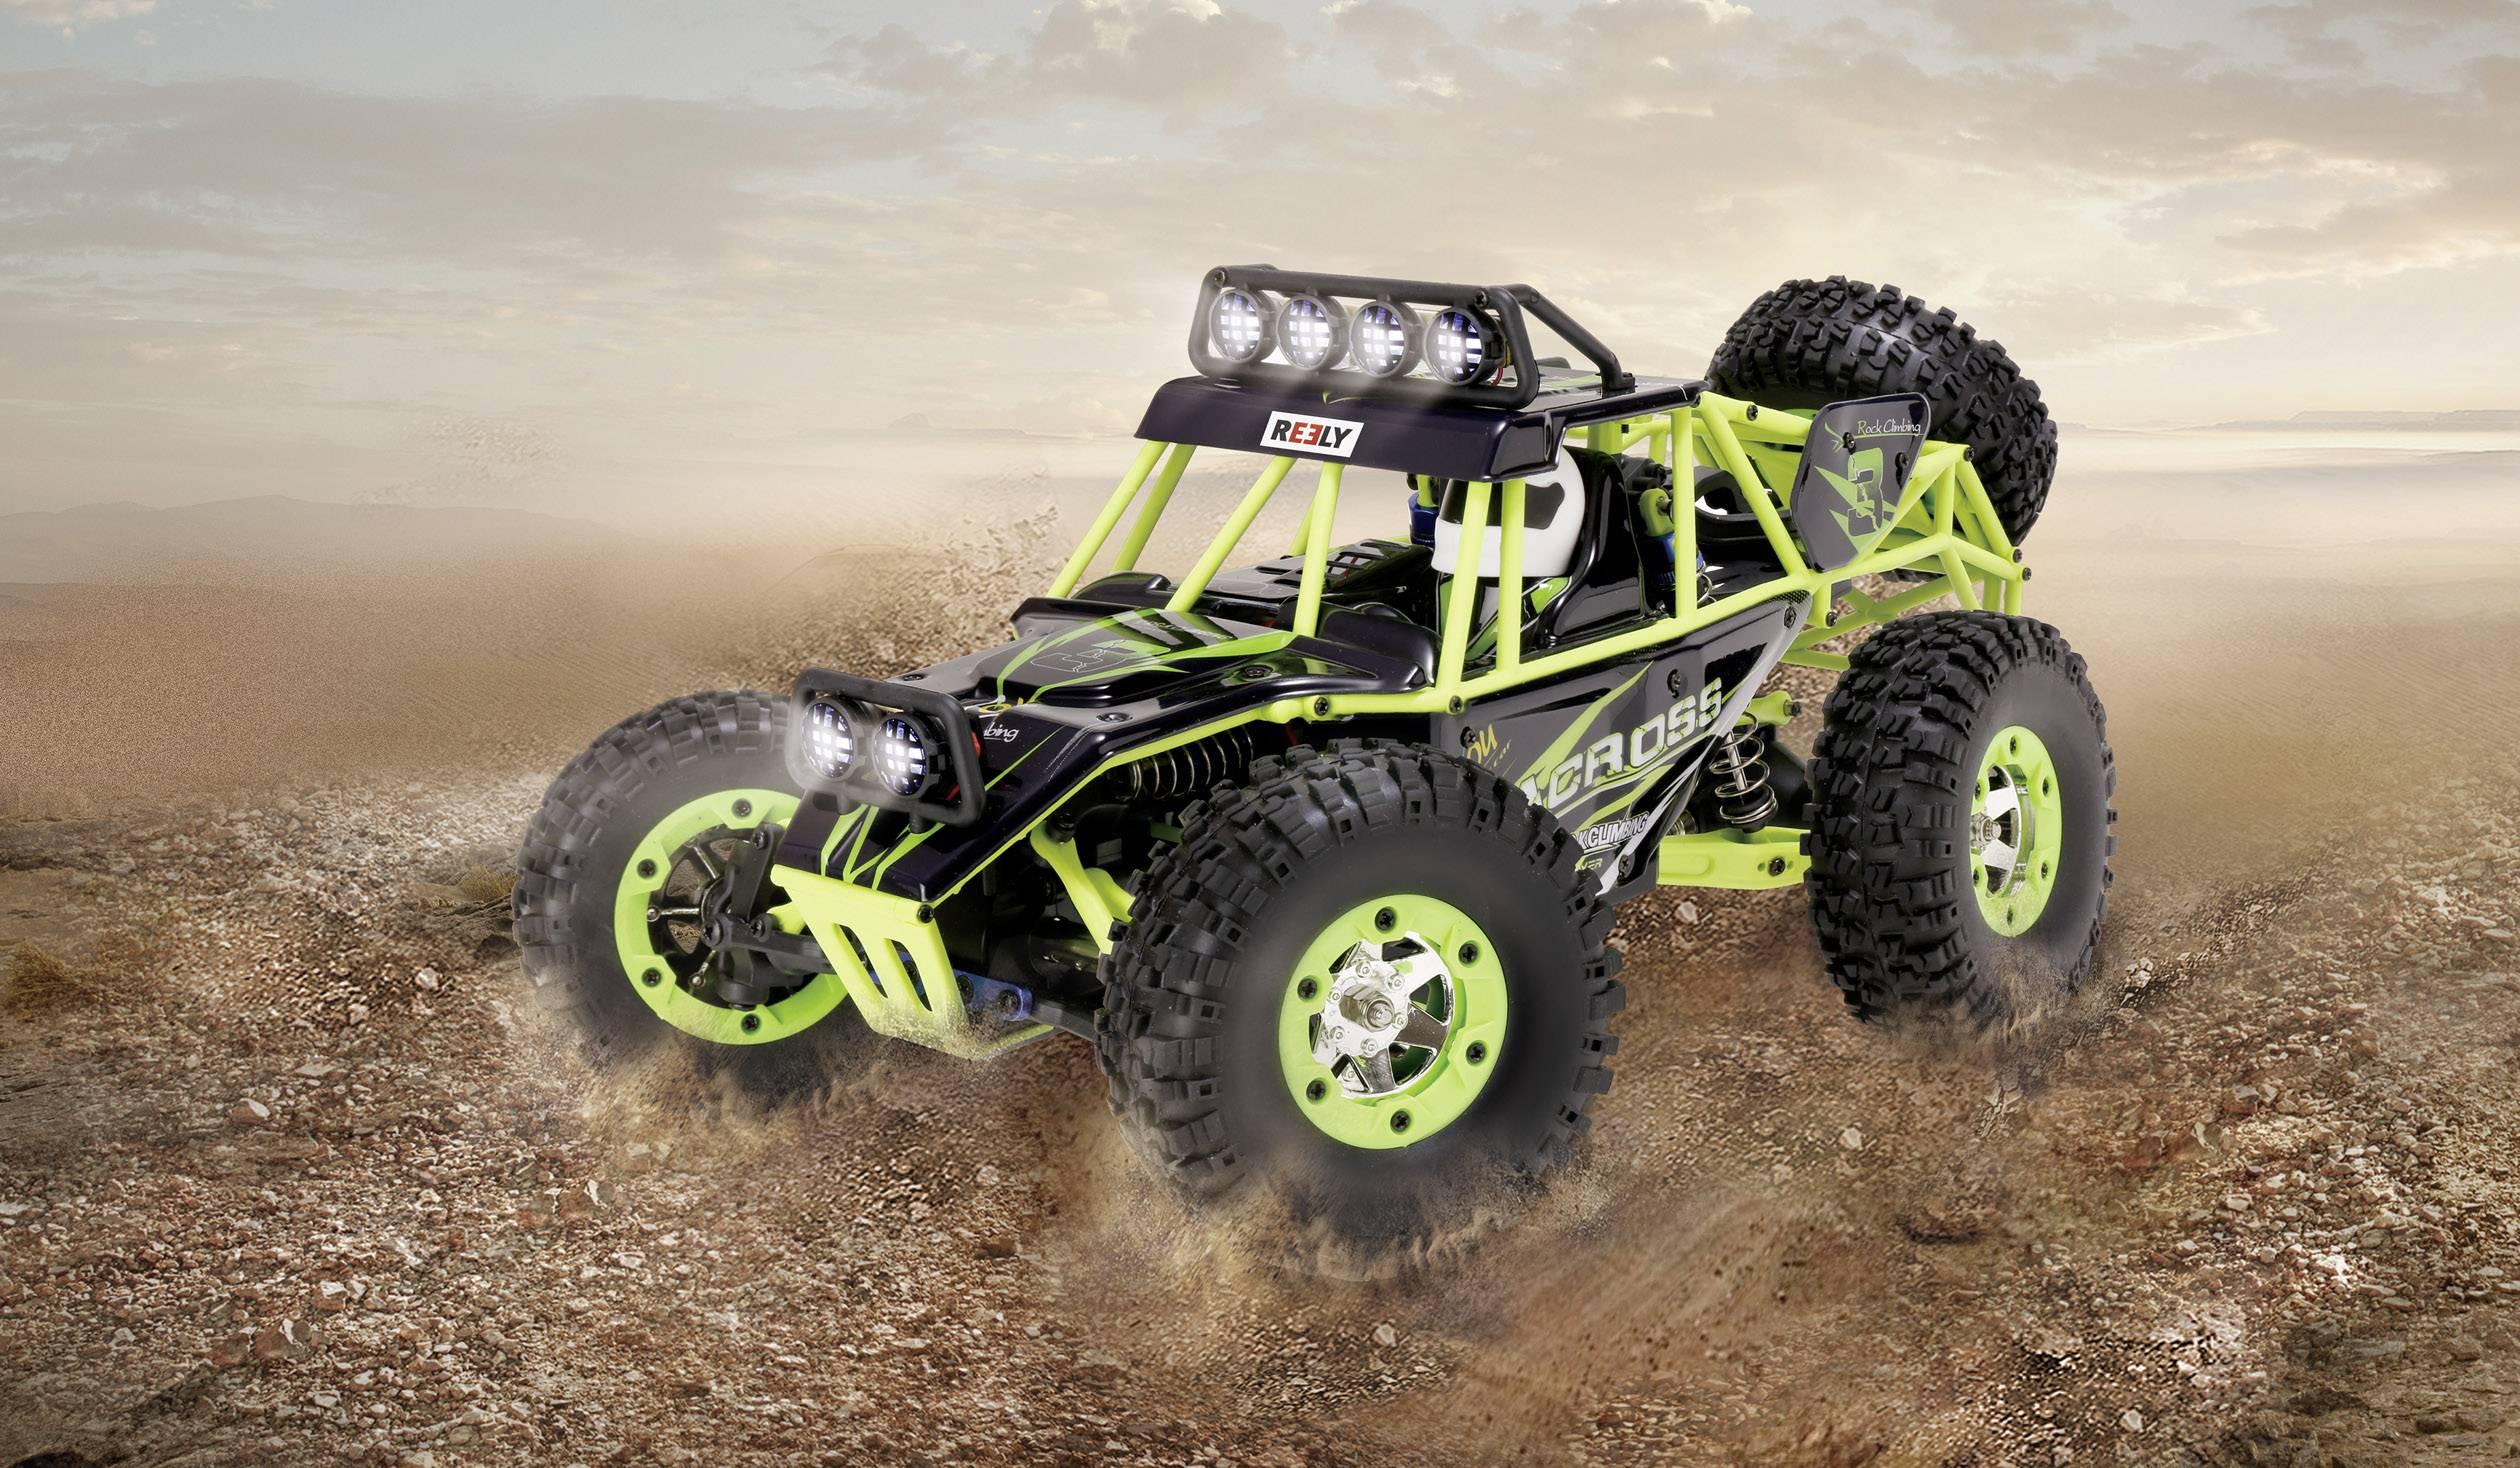 RC model auta buggy Reely Desert Climber, komutátorový, 1:10 XS, 4WD (4x4), RtR, 25 km/h